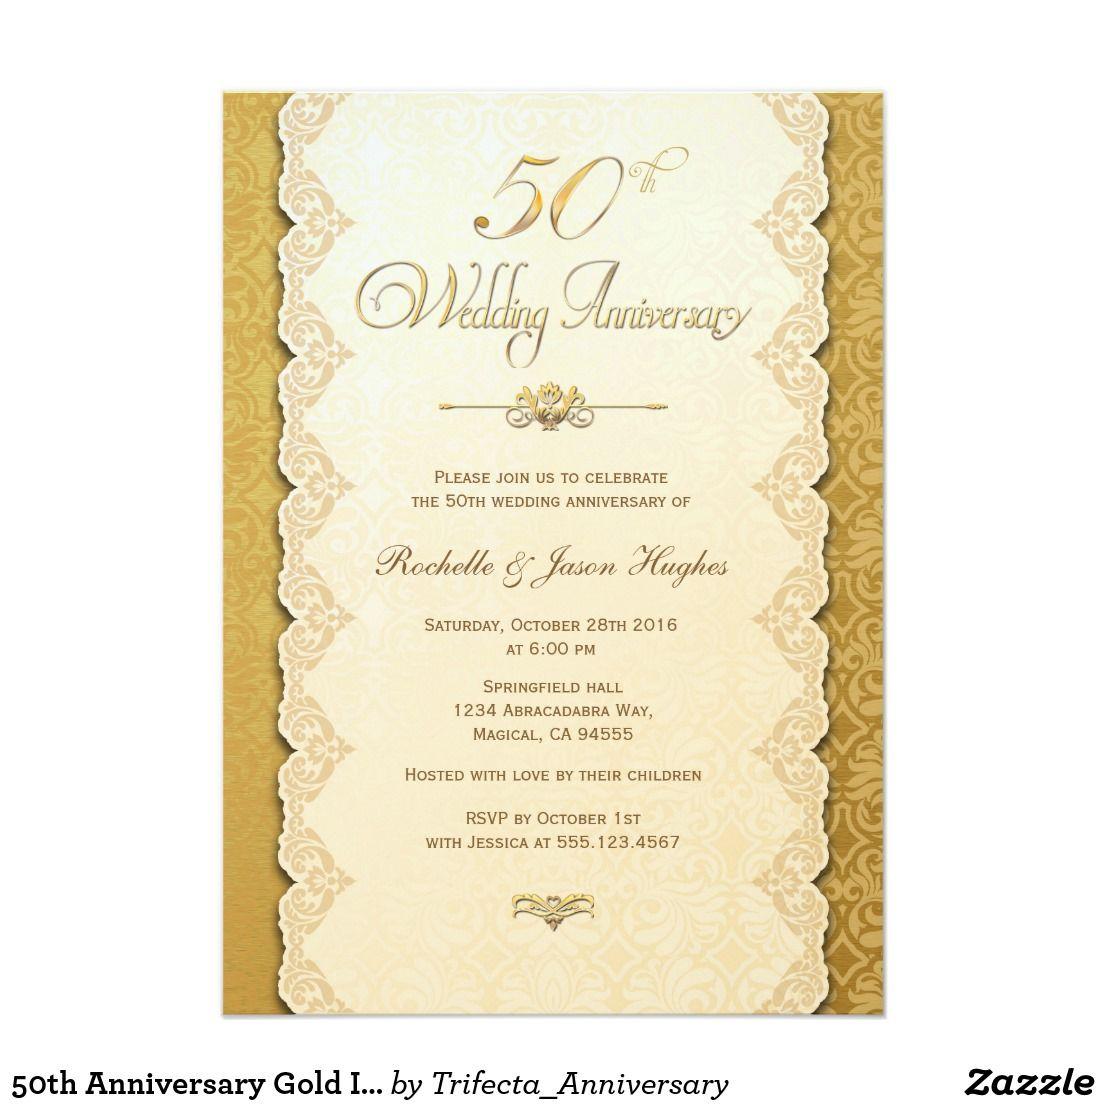 50th Anniversary Gold Invitation | Gold invitations, Elegant wedding ...